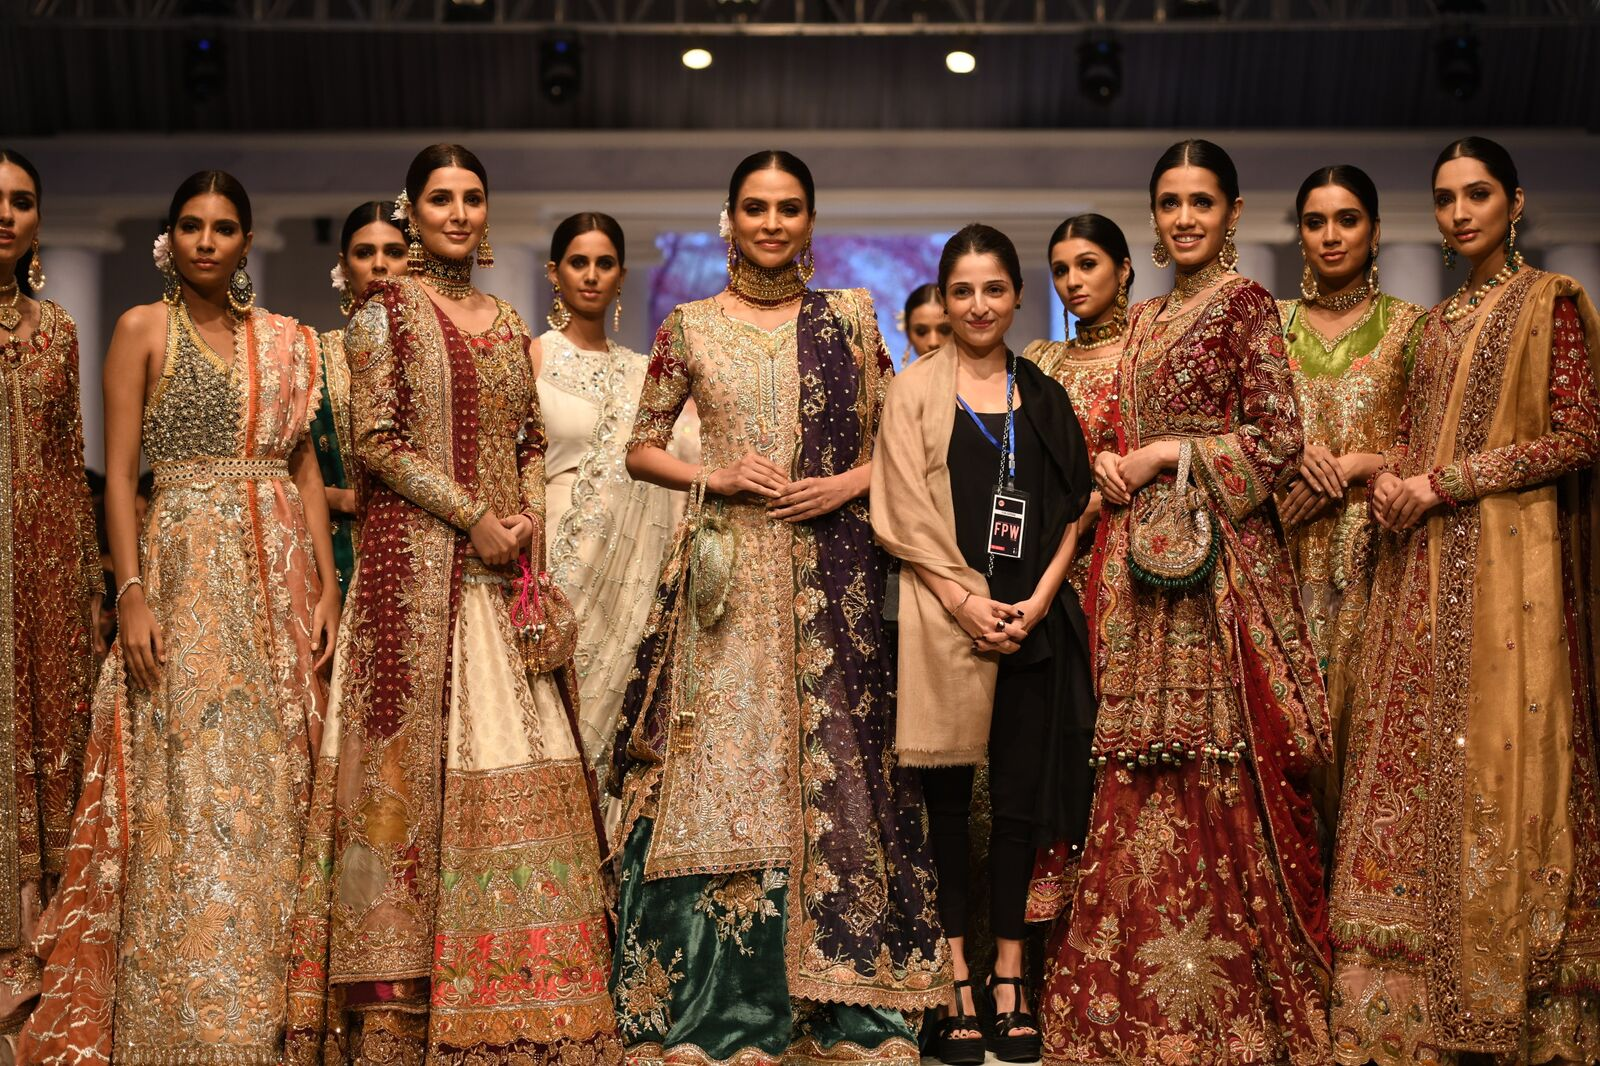 Rara Avis; Tena Durrani's Latest Bridal Collection Is One of a Kind